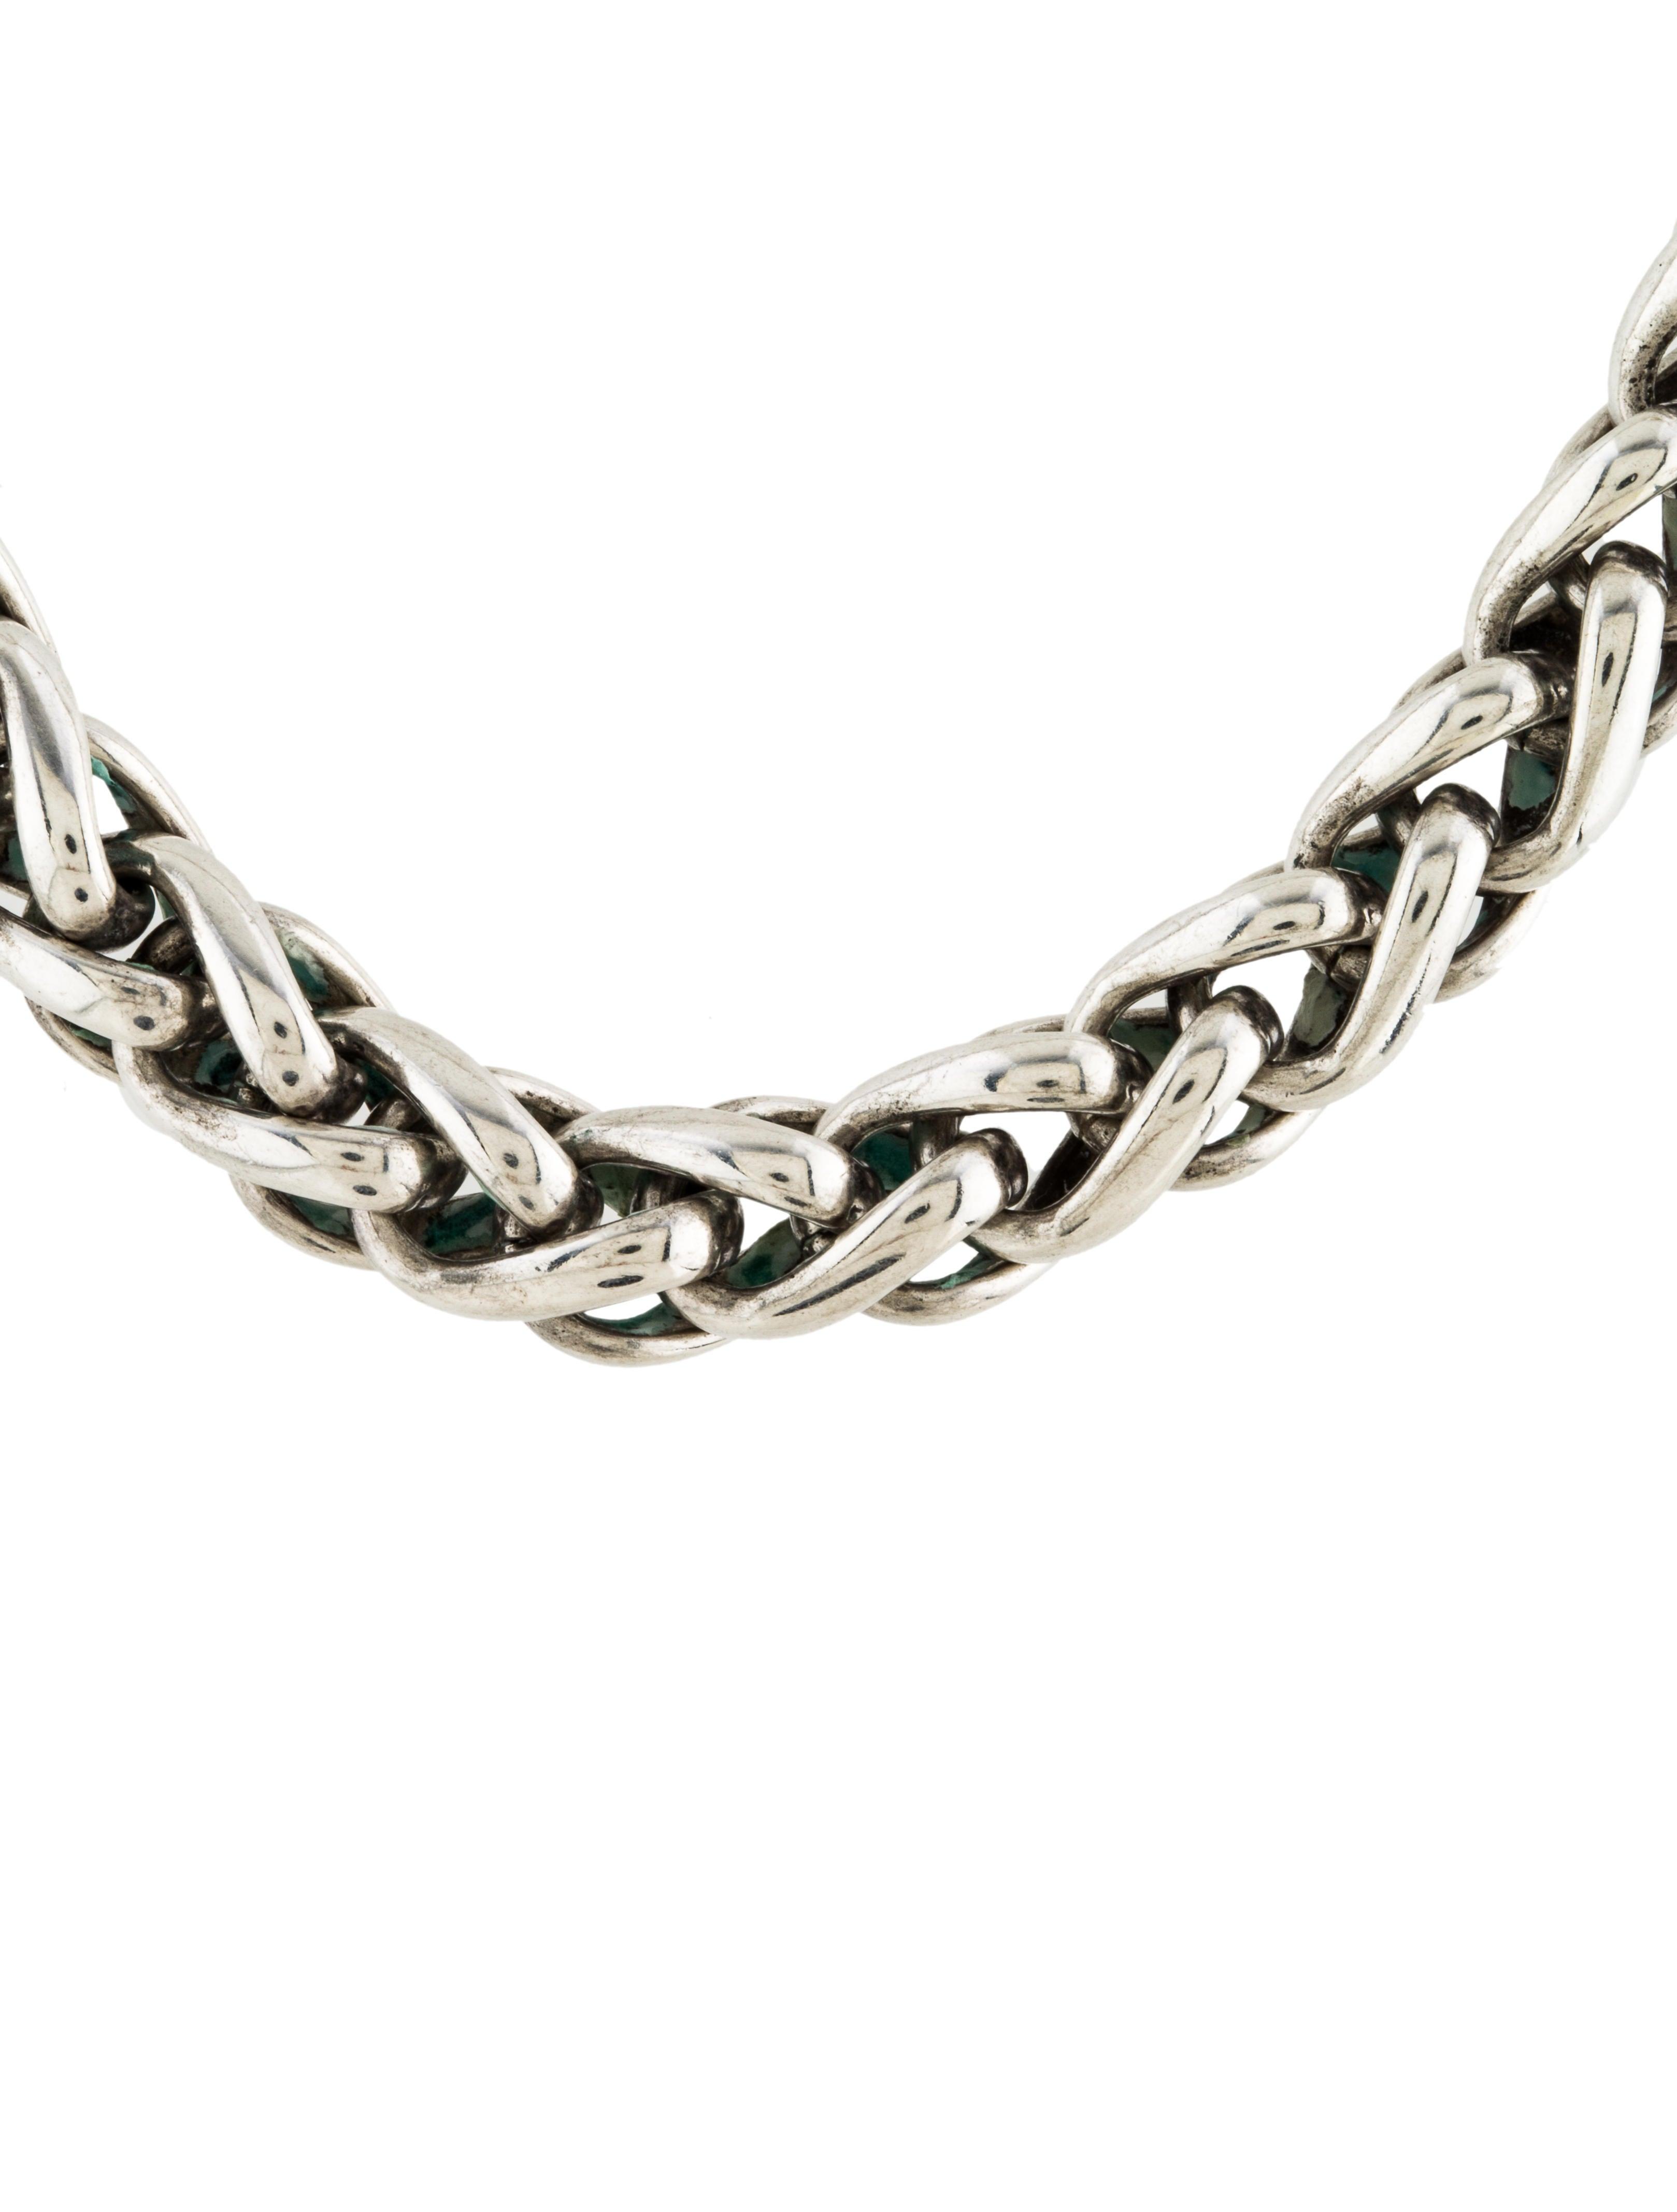 David Yurman Two Tone Wheat Chain Necklace Necklaces